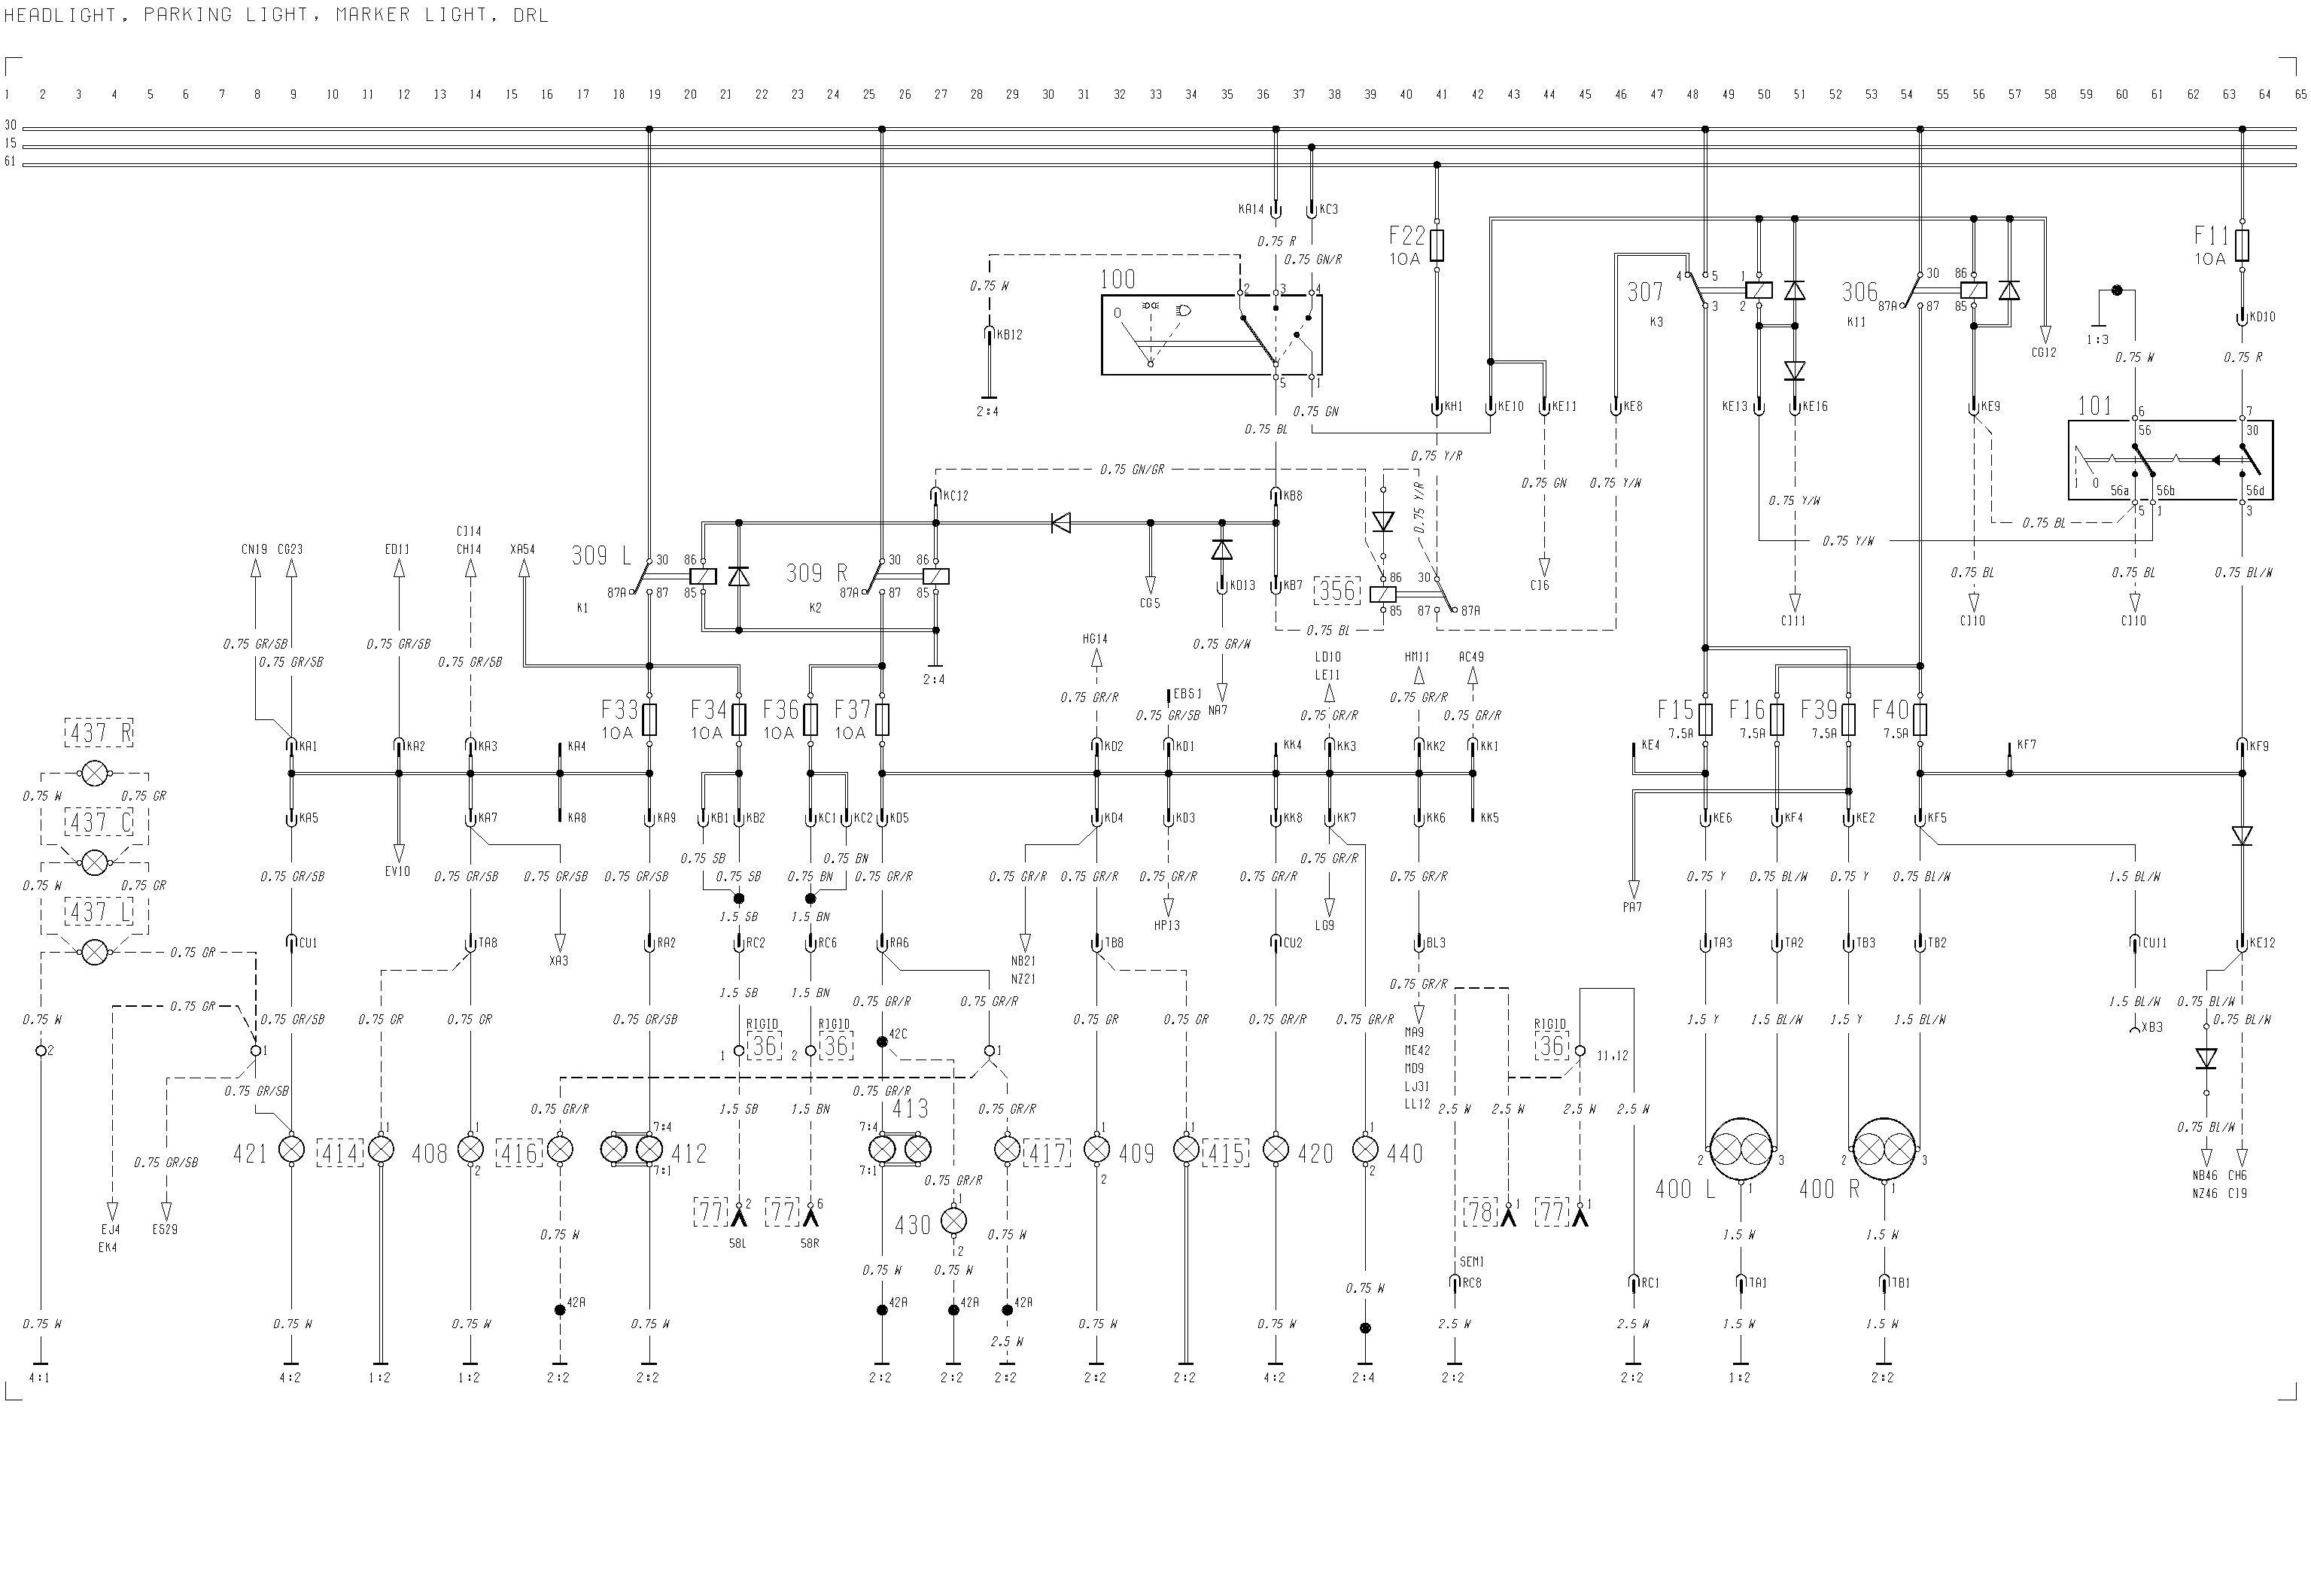 Volvo F12, F16 - wiring diagram - headlight, parking light ... on volvo headlight switch, volvo headlight assembly diagram, volvo s40 parts diagram, volvo alternator wiring diagram,